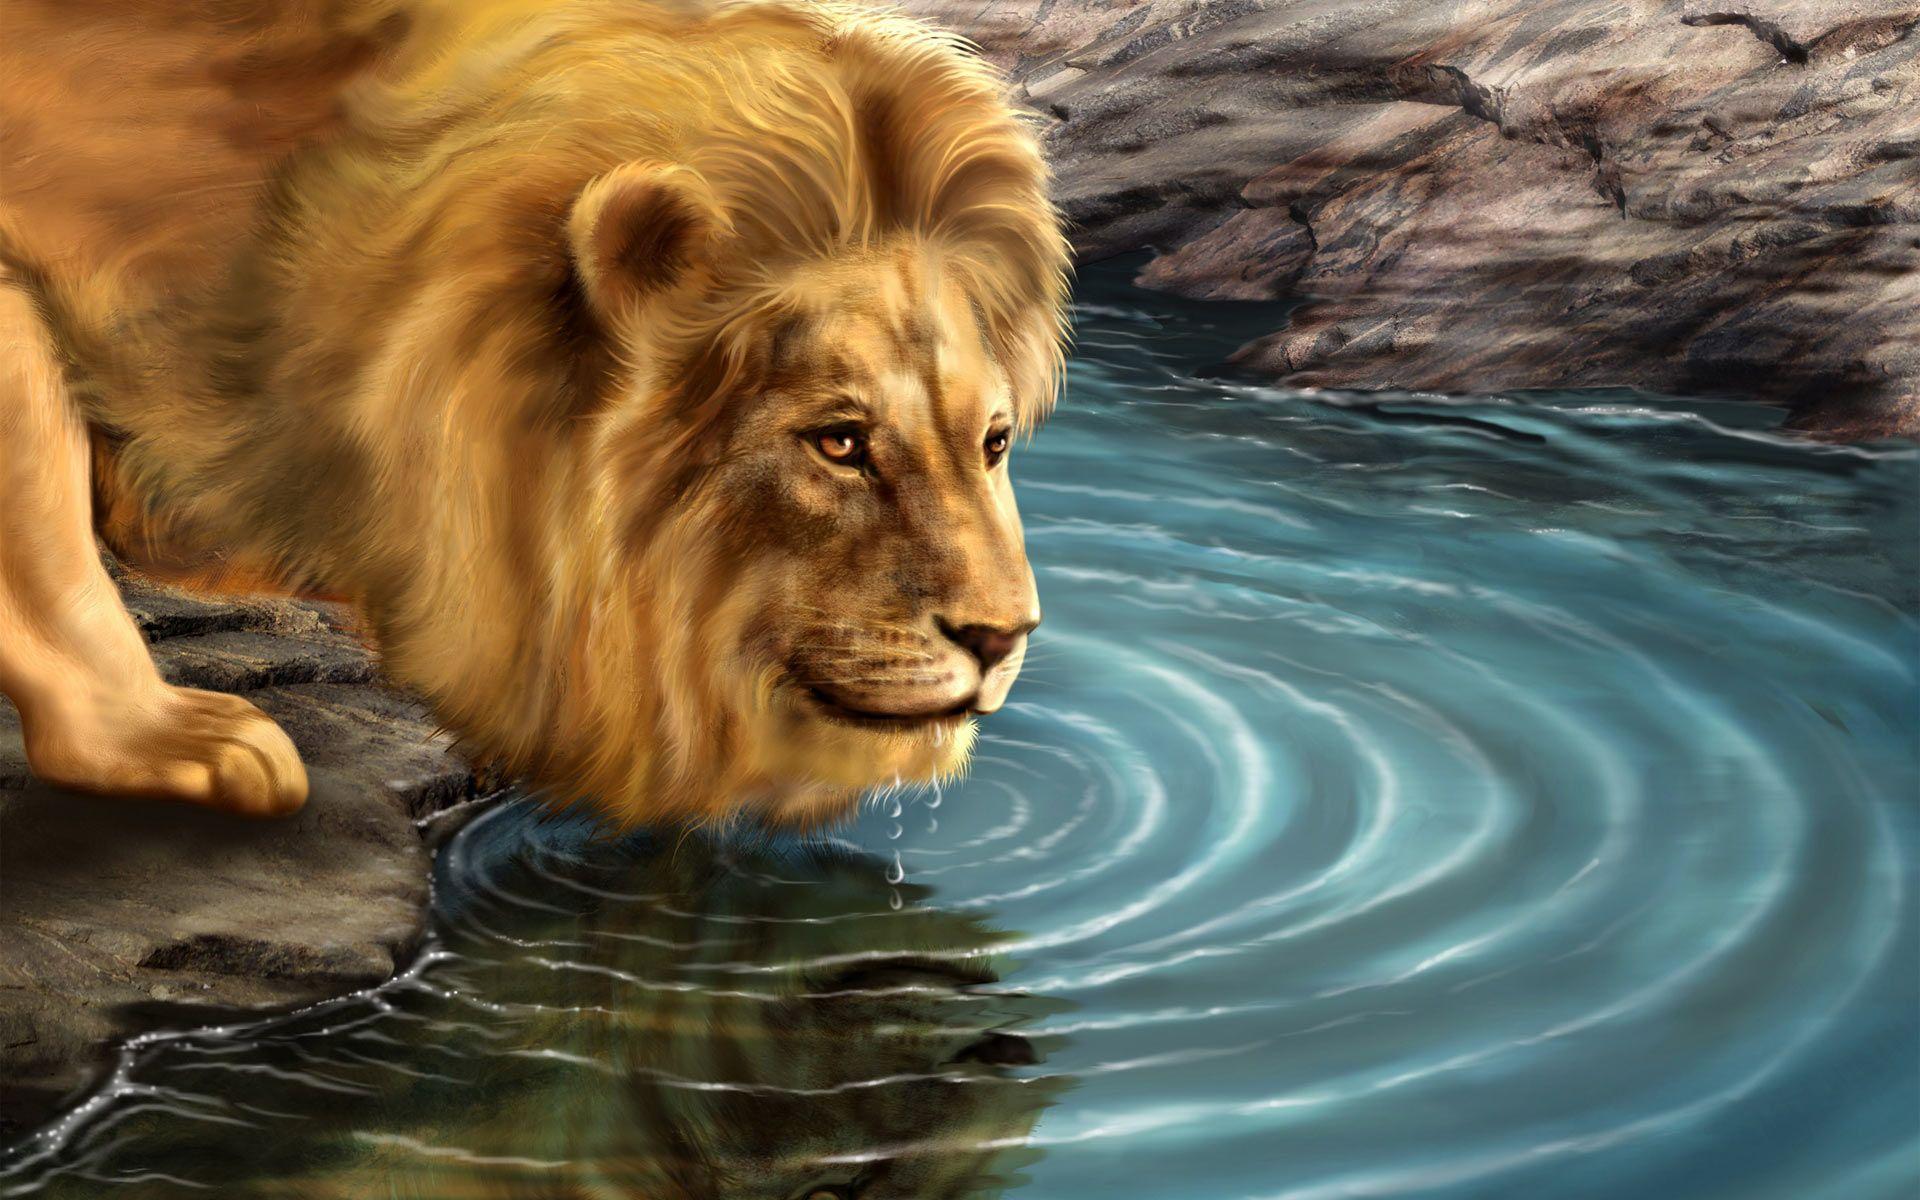 Wallpaper download lion - Lion Wallpaper